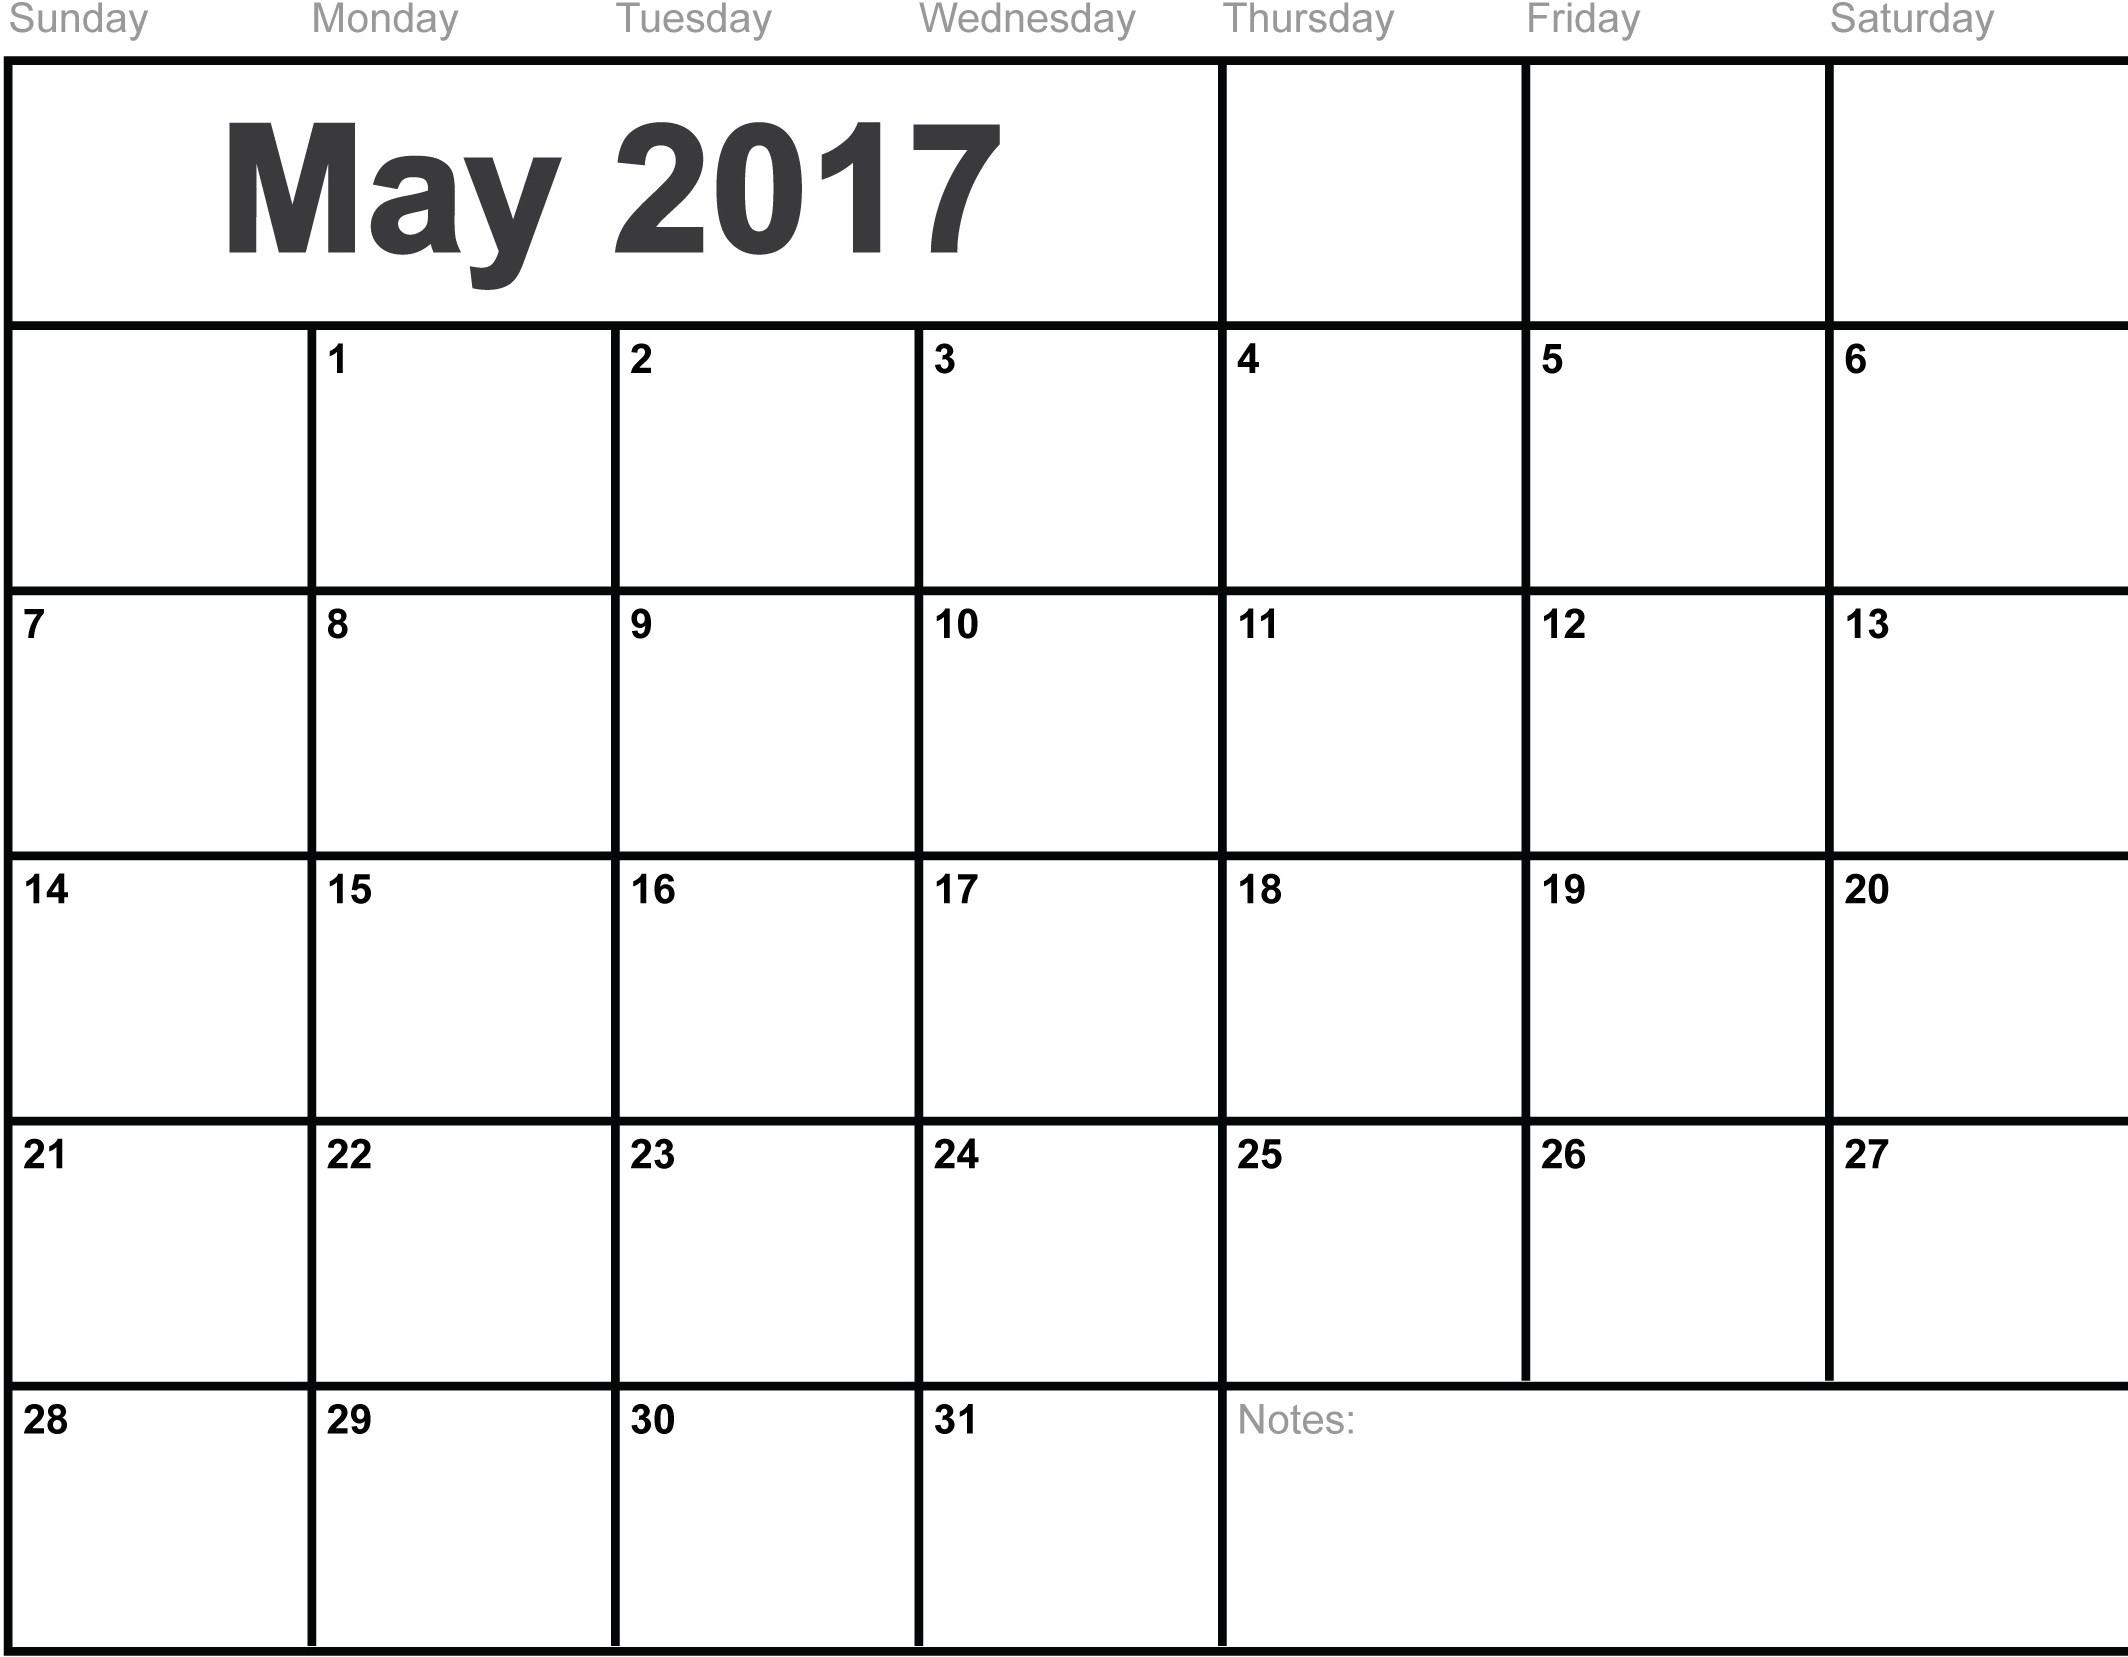 May 2017 Calendar Printable | Templates Social Funda